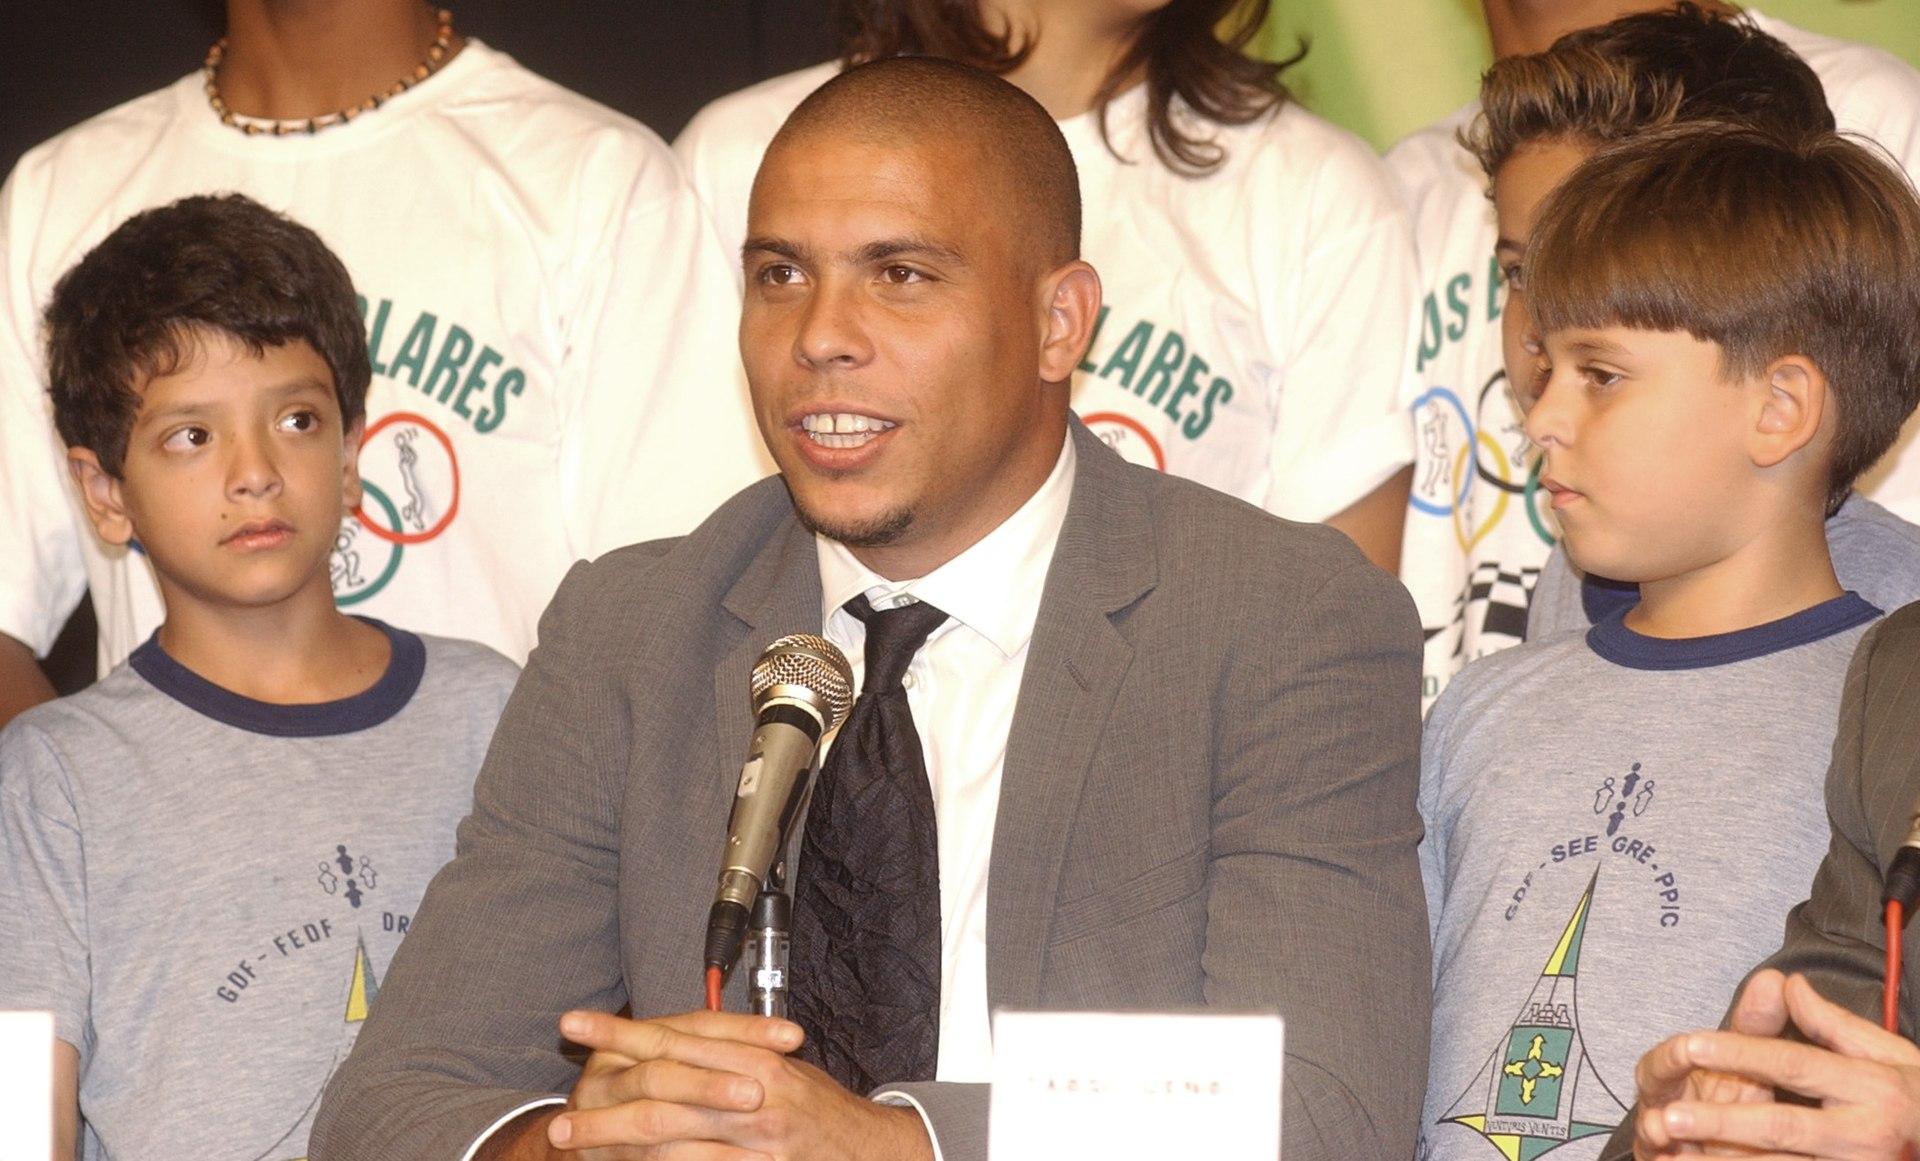 Brasilianischer Ronaldo